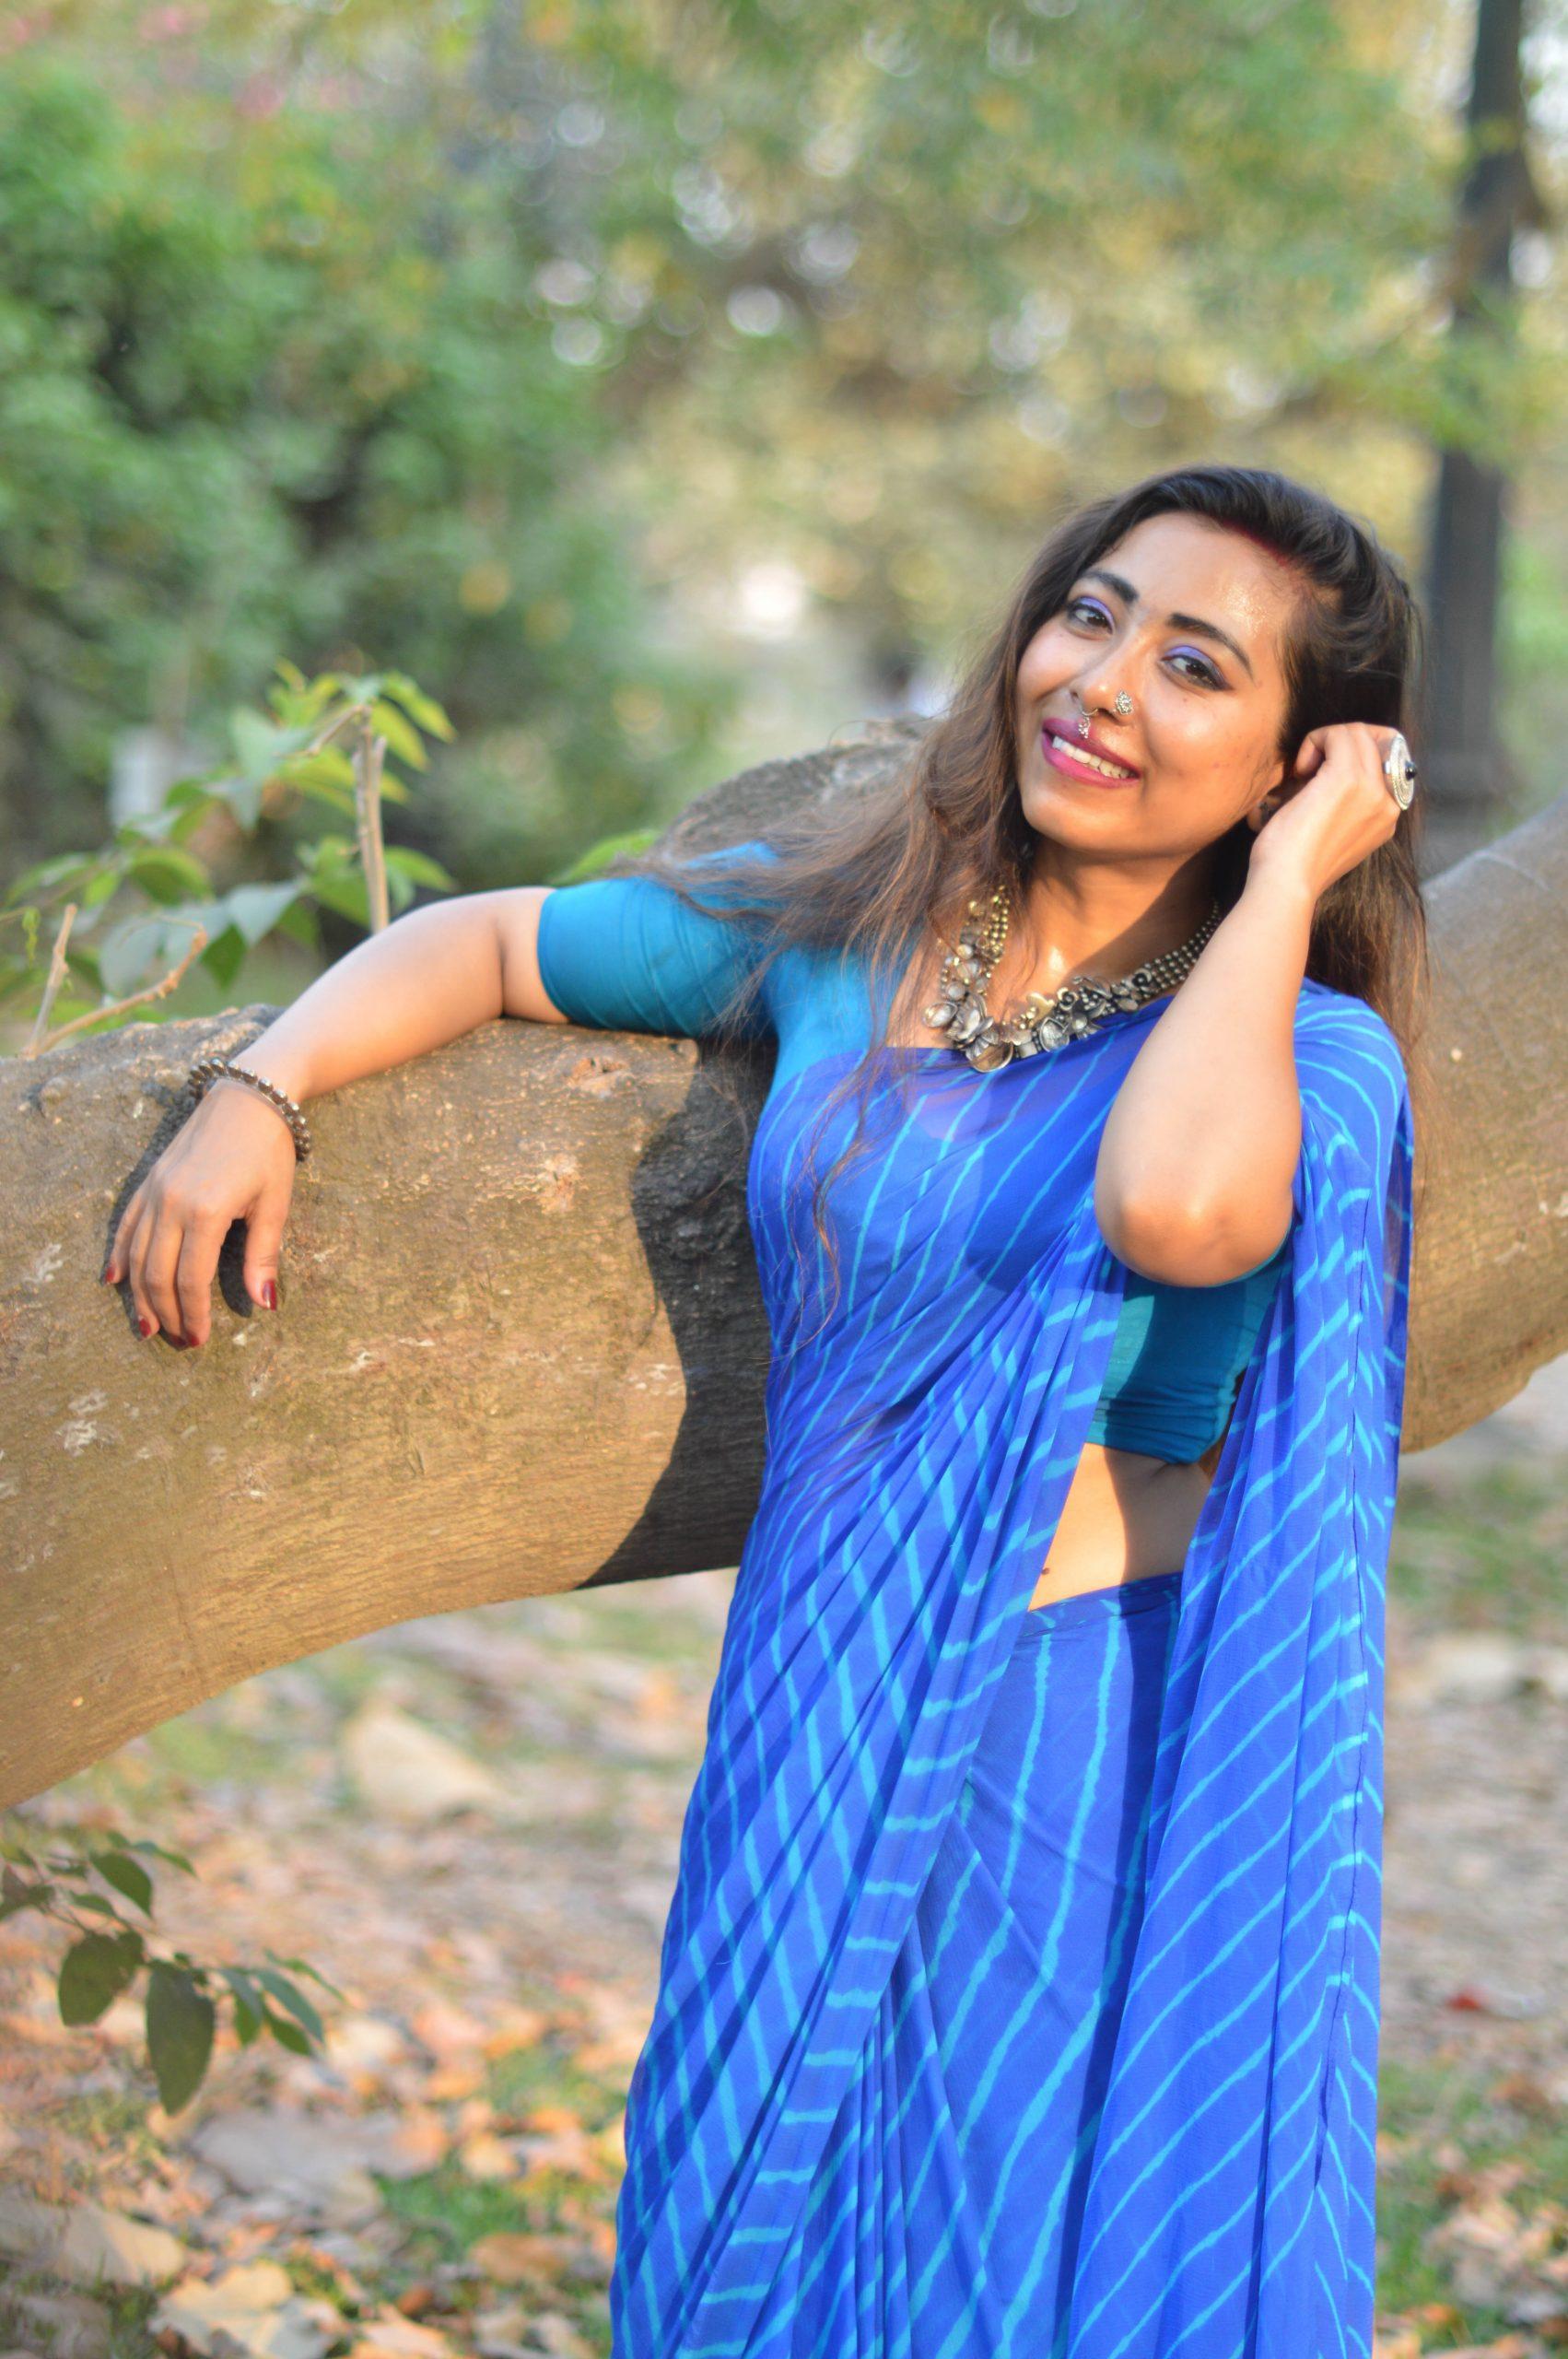 Beautiful girl posing near the tree trunk